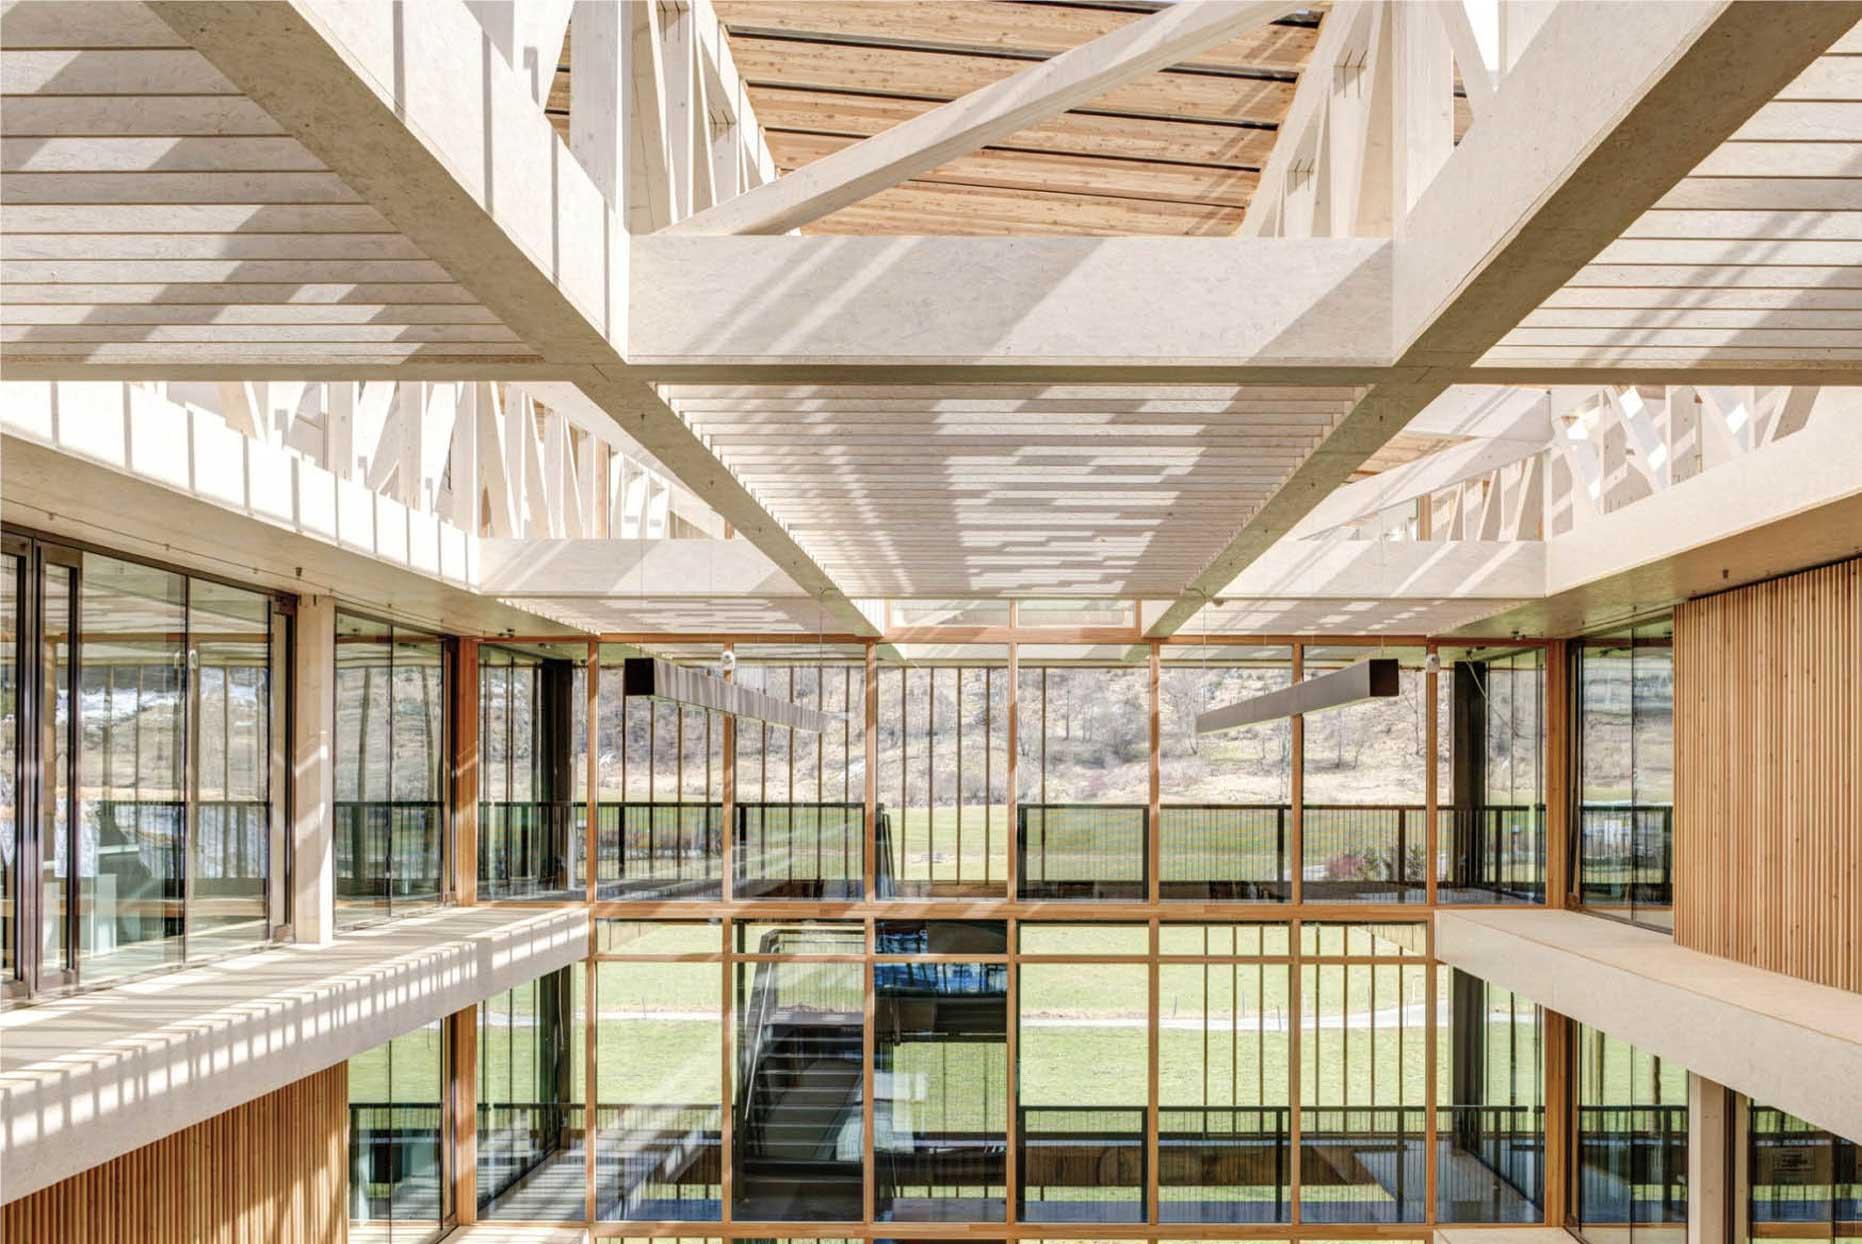 Holzrahmenbau-Foyer